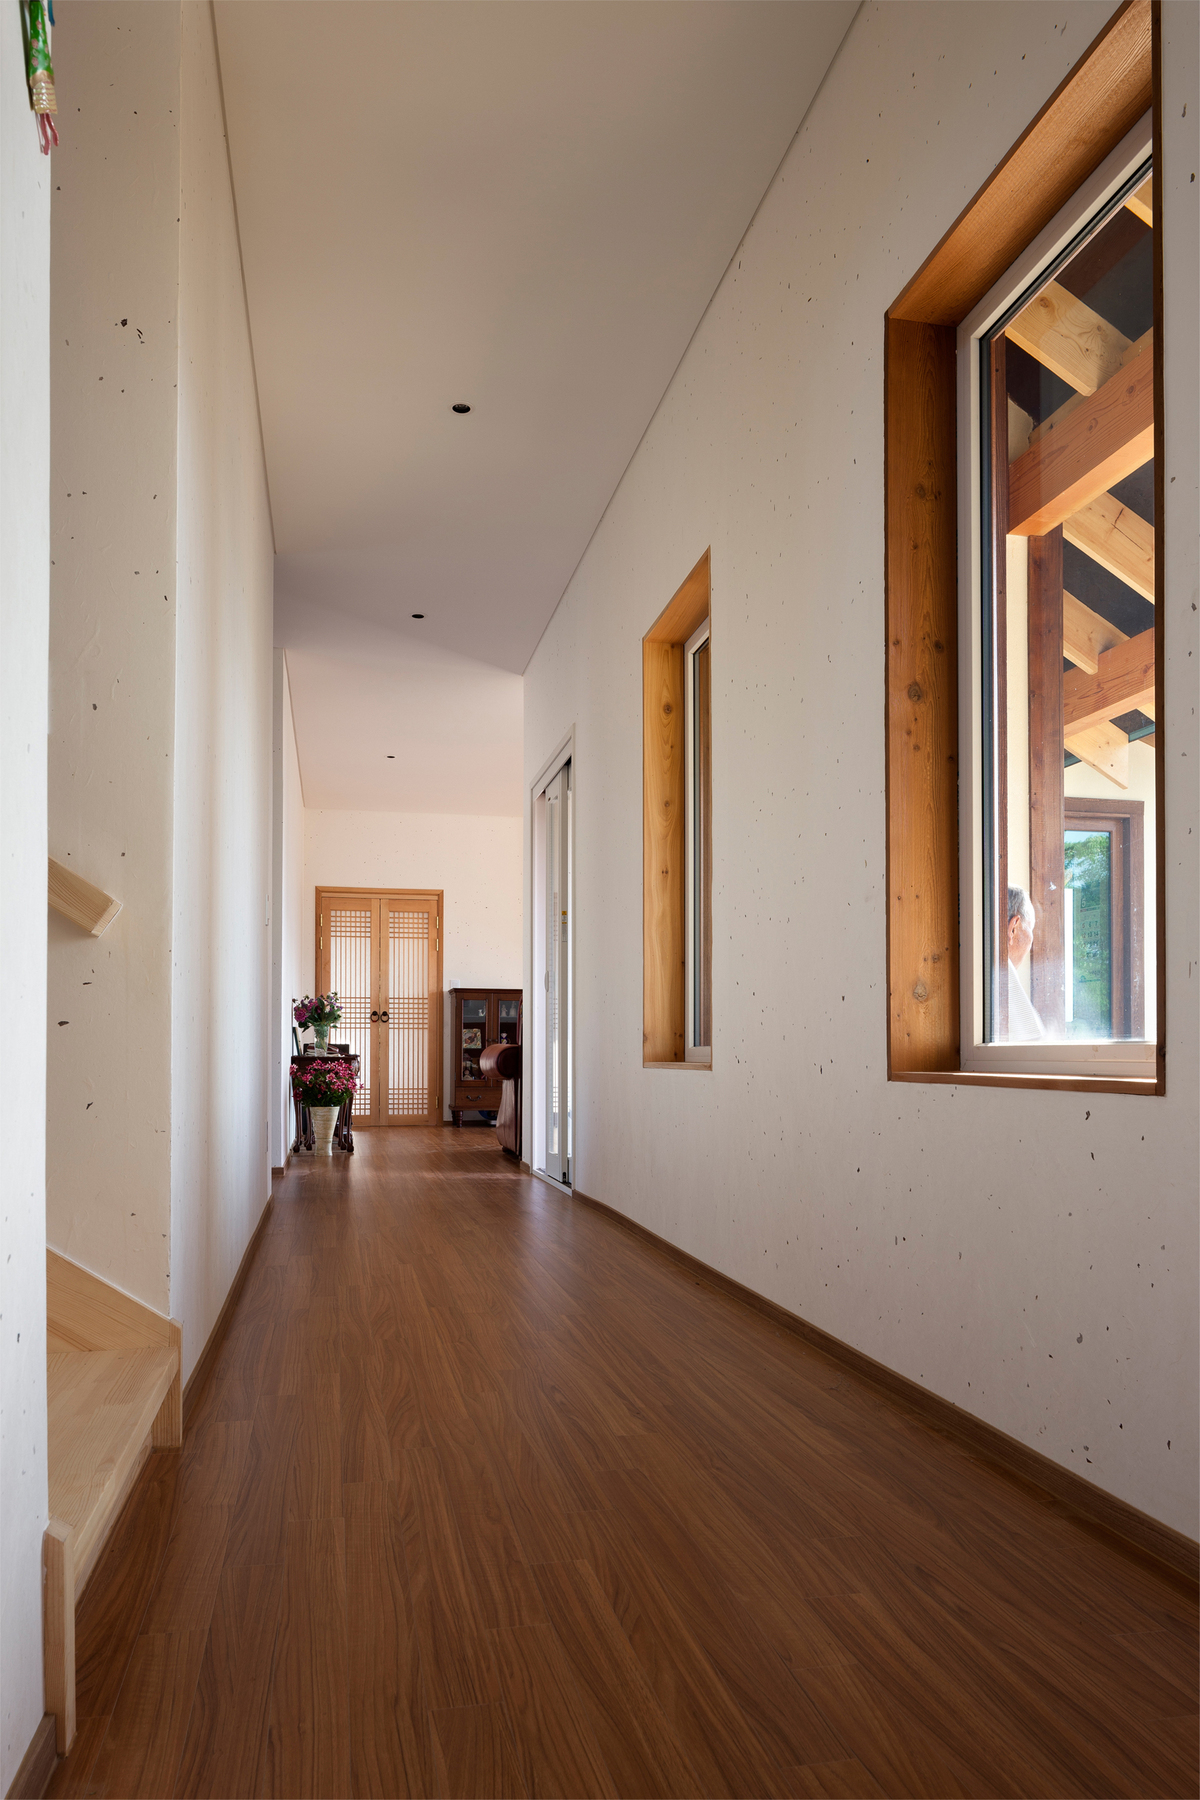 House in Geochang, South Korea by Hyungnam Lim, Eunjoo Roh + studio_GAON (interior)